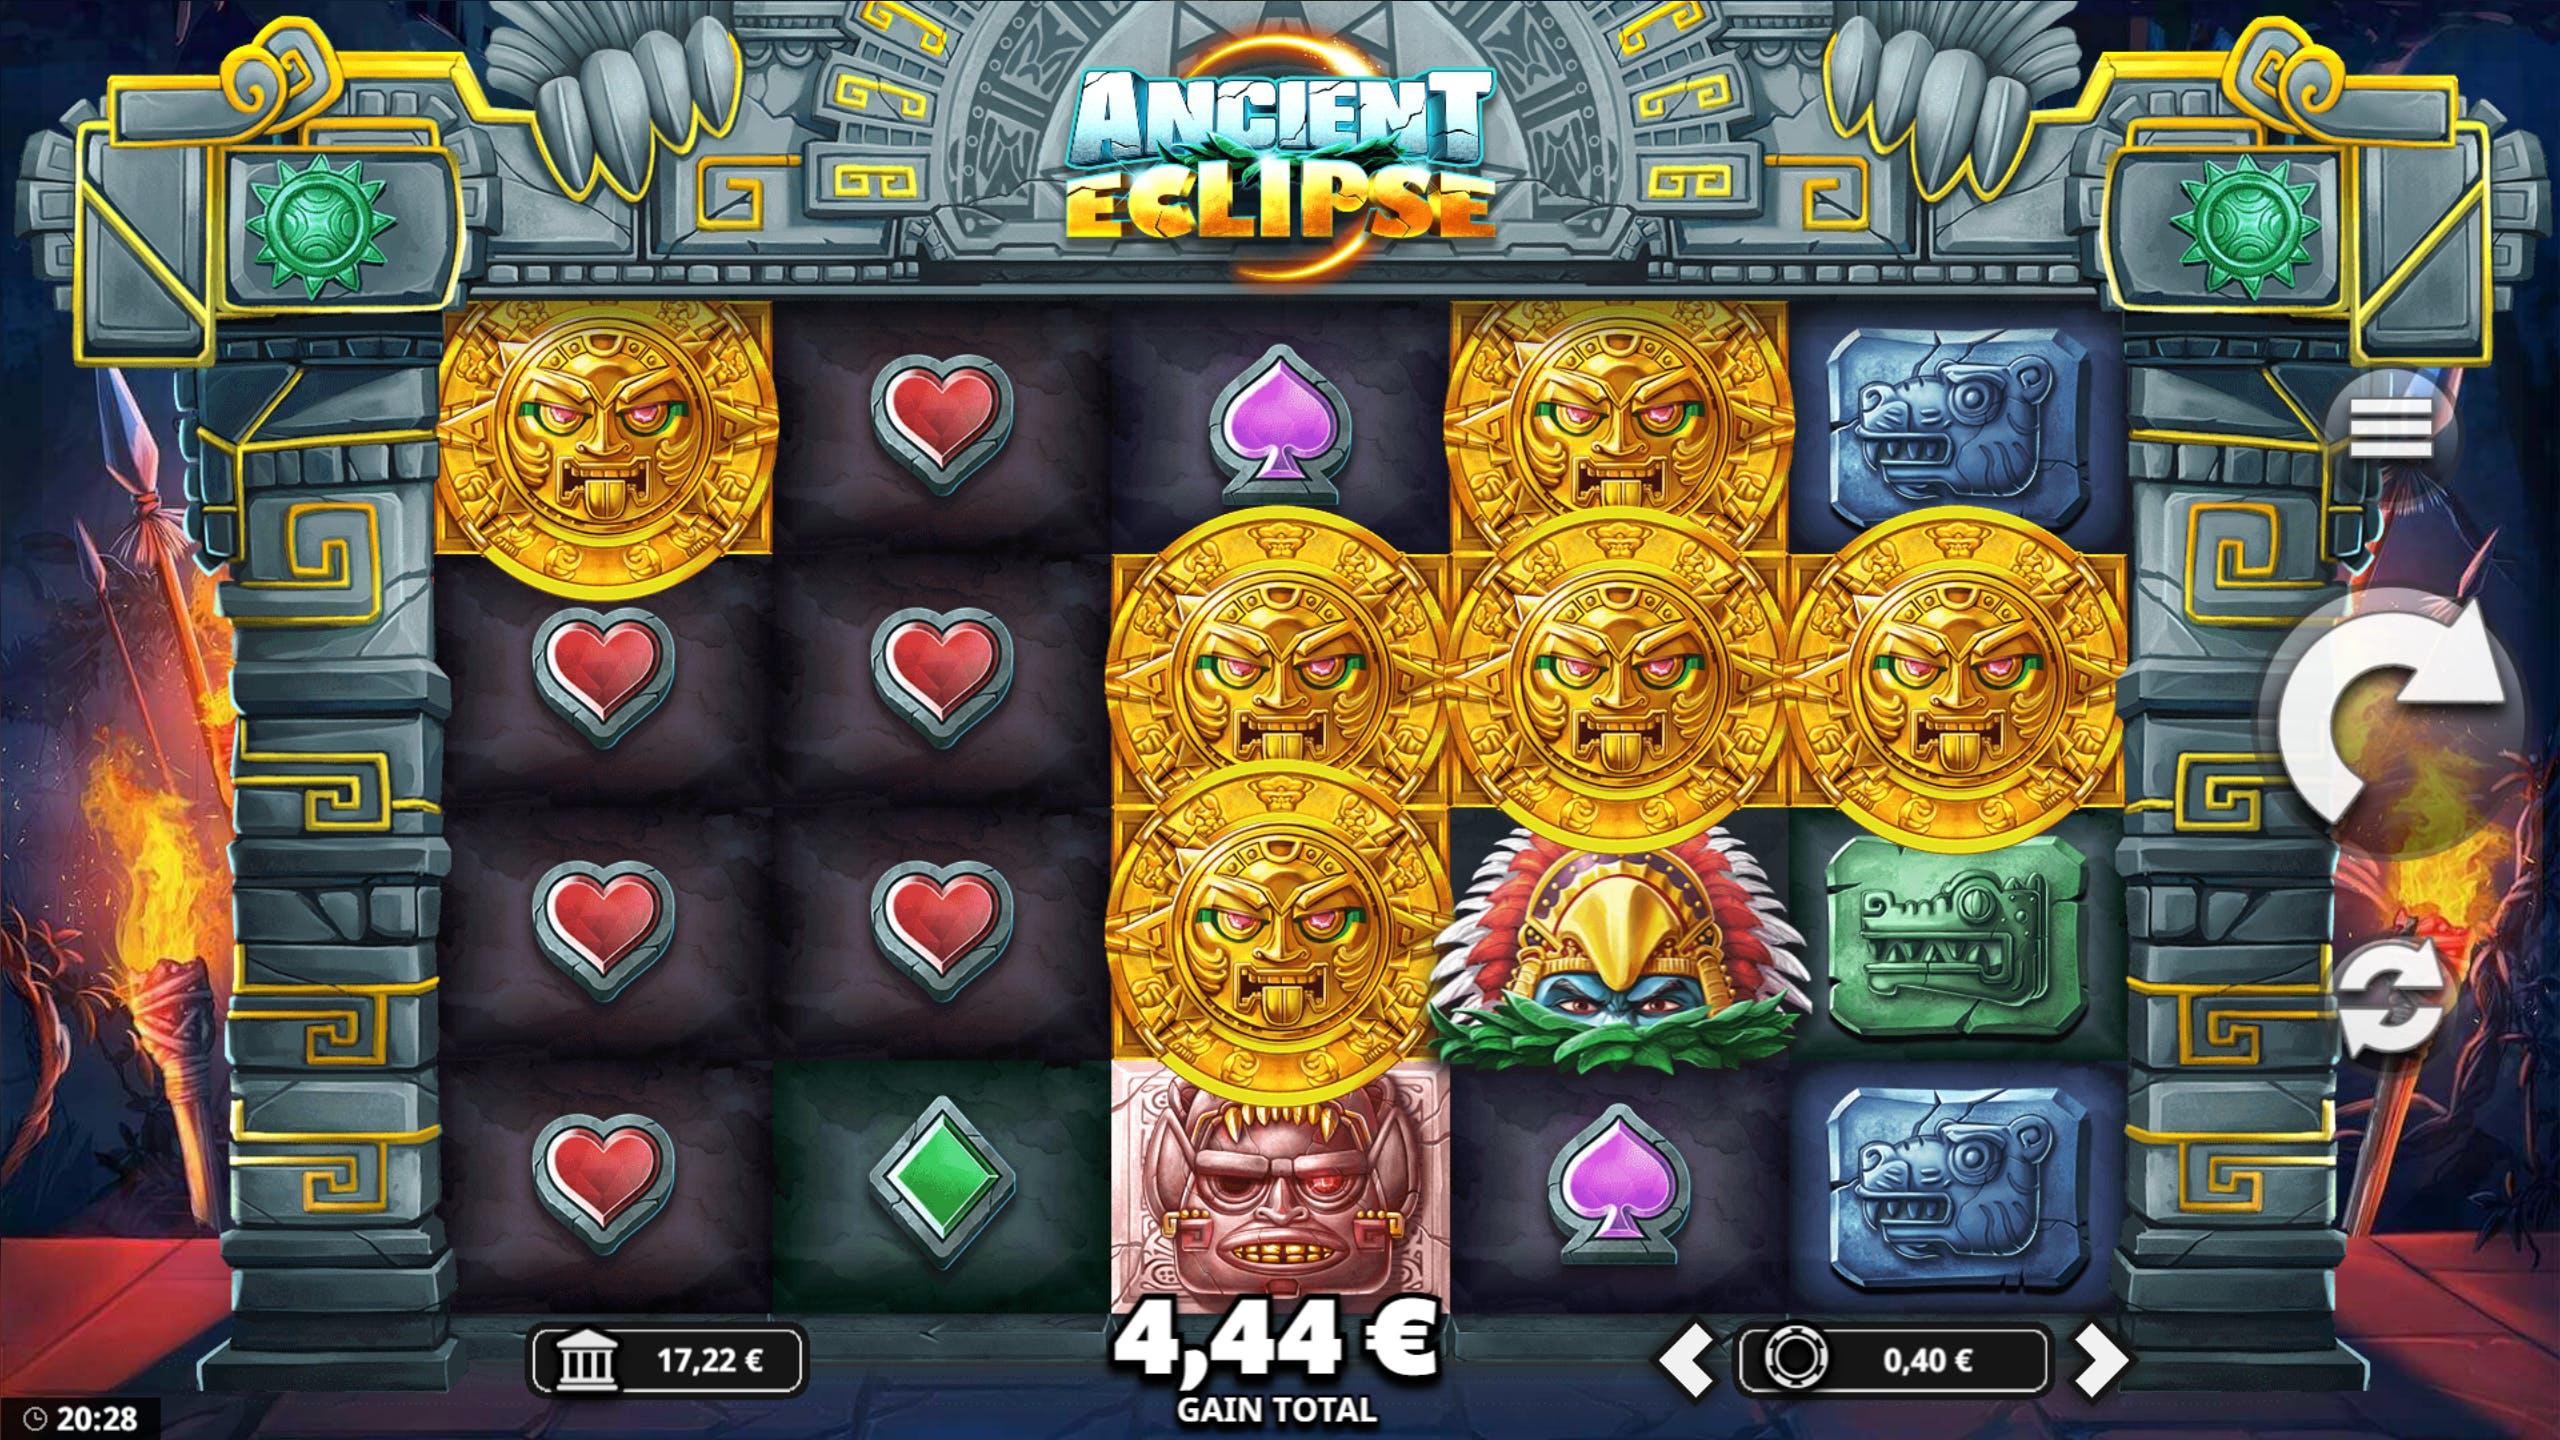 ancient eclipse gameplay sticky wilds casino